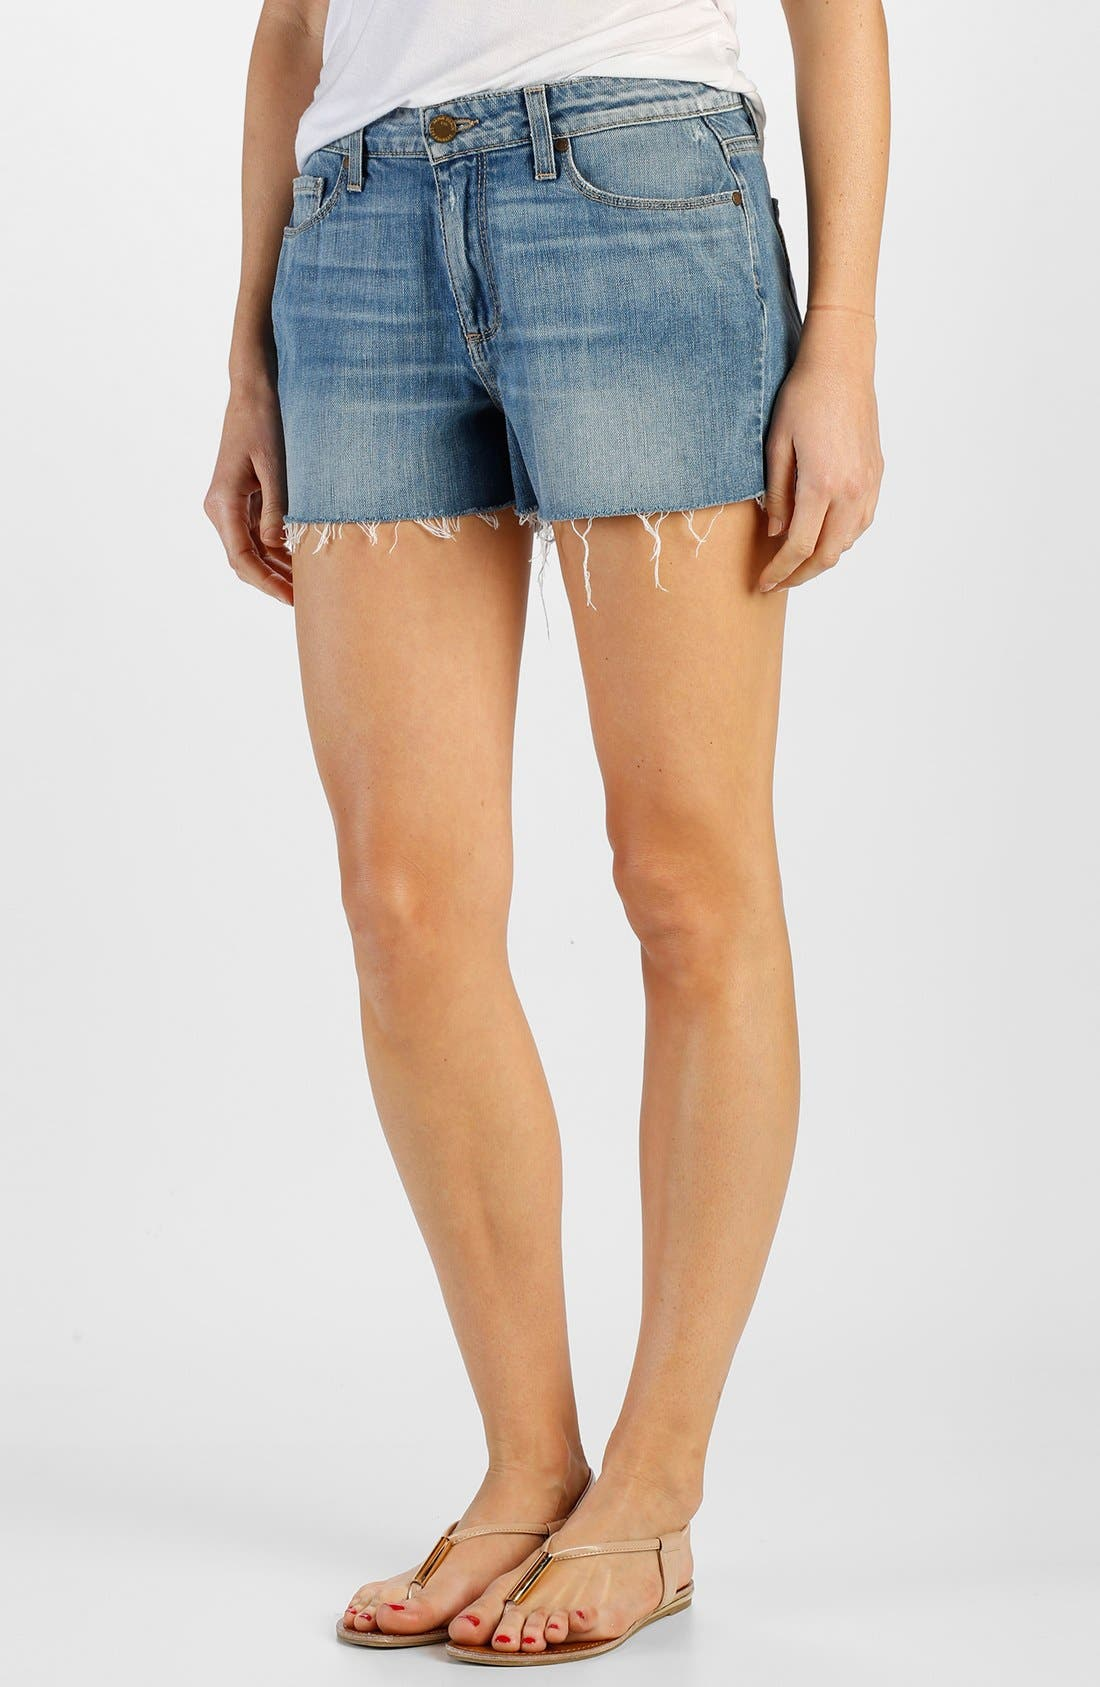 Alternate Image 1 Selected - Paige Denim 'Callie' High Rise Cutoff Denim Shorts (Tomlin)